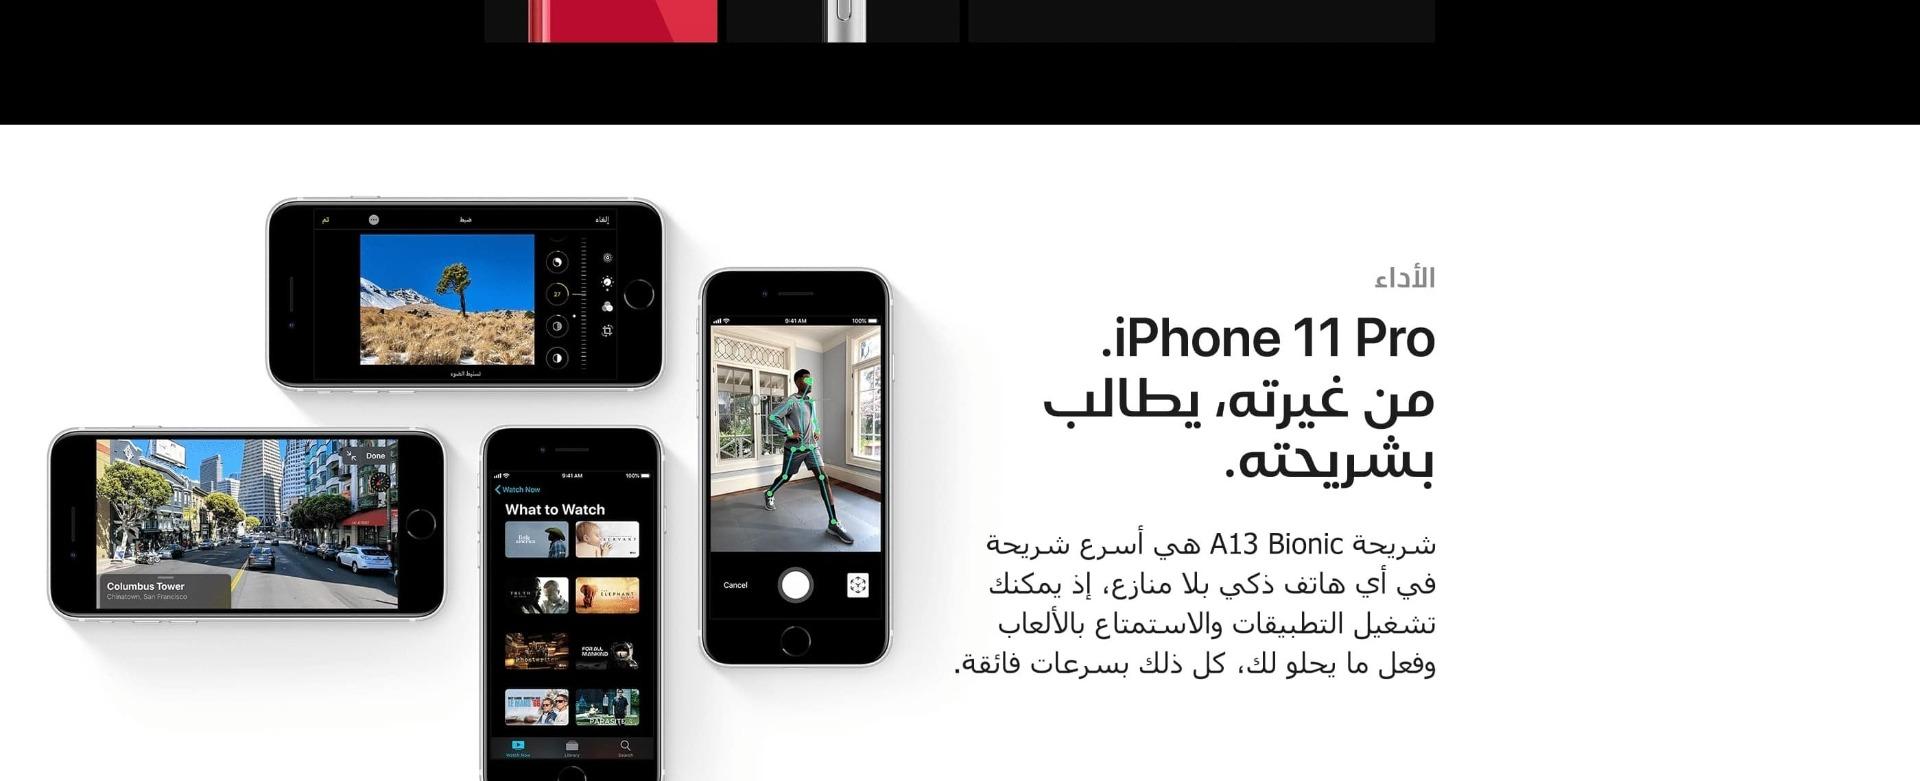 "New iPhone SE""></p> <p style="